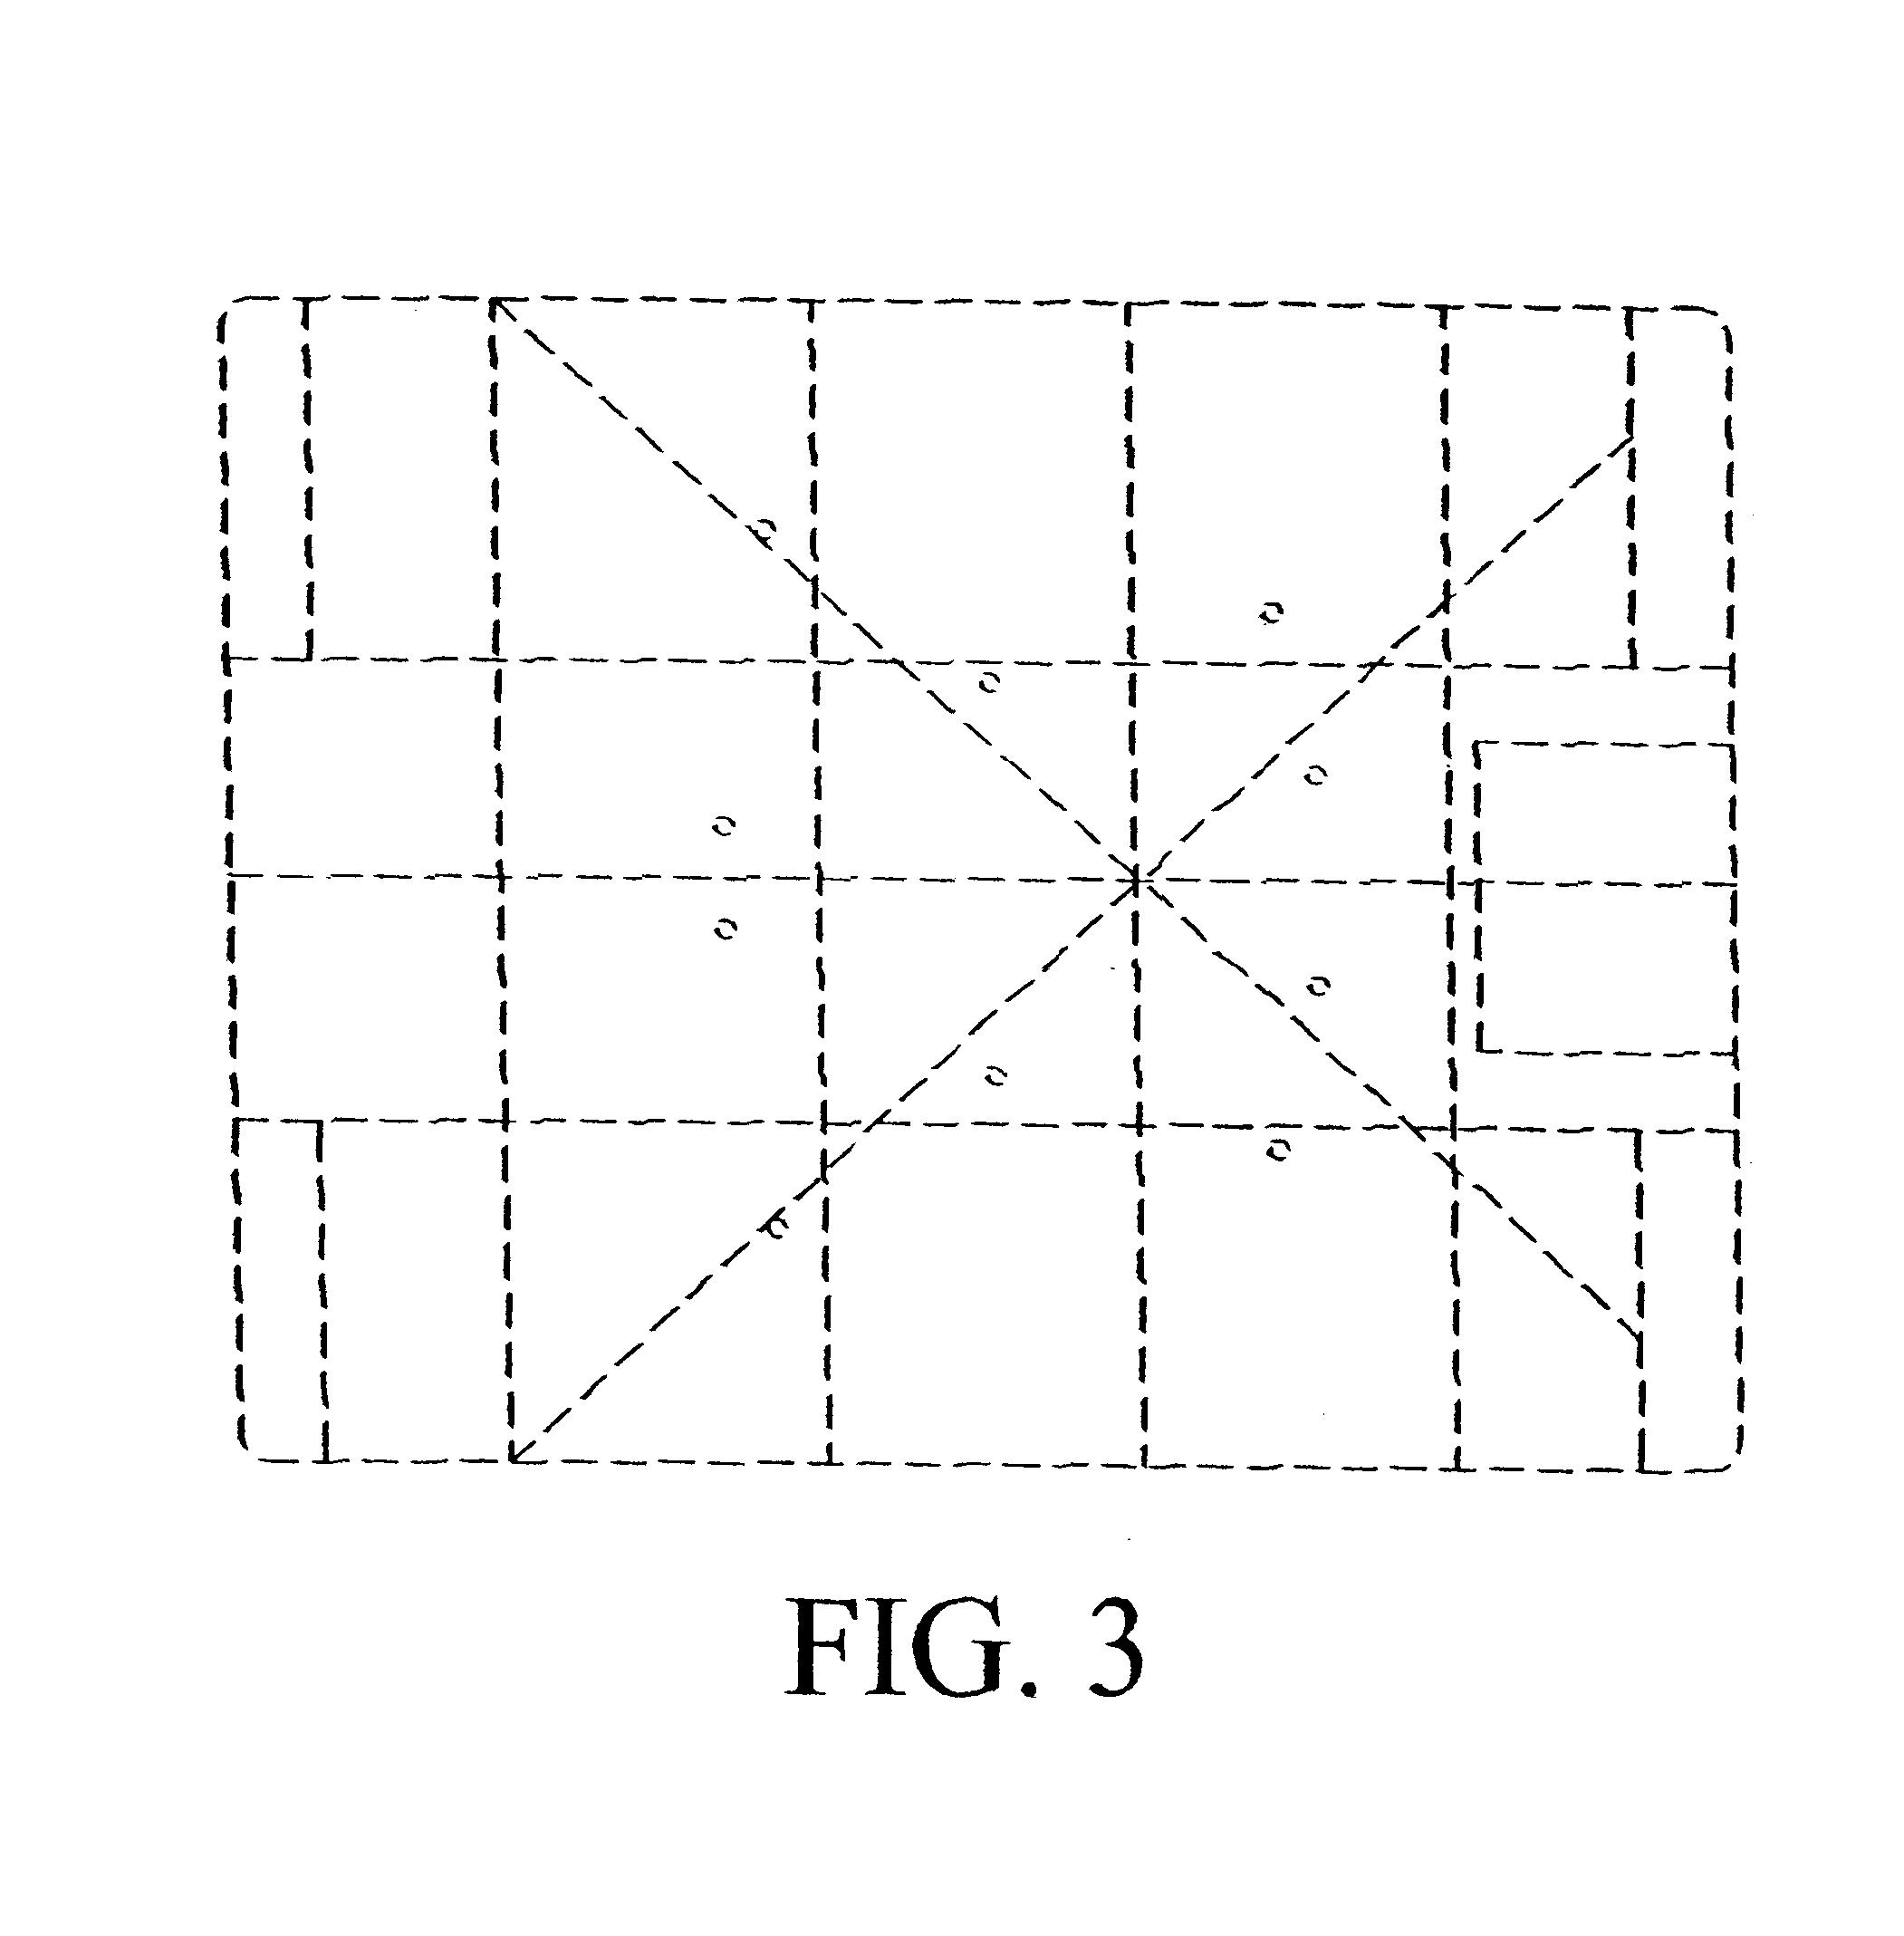 Brevet Usd516507 Generator Google Brevete Onan 6 3 Propane Rv Wiring Diagram Patent Drawing